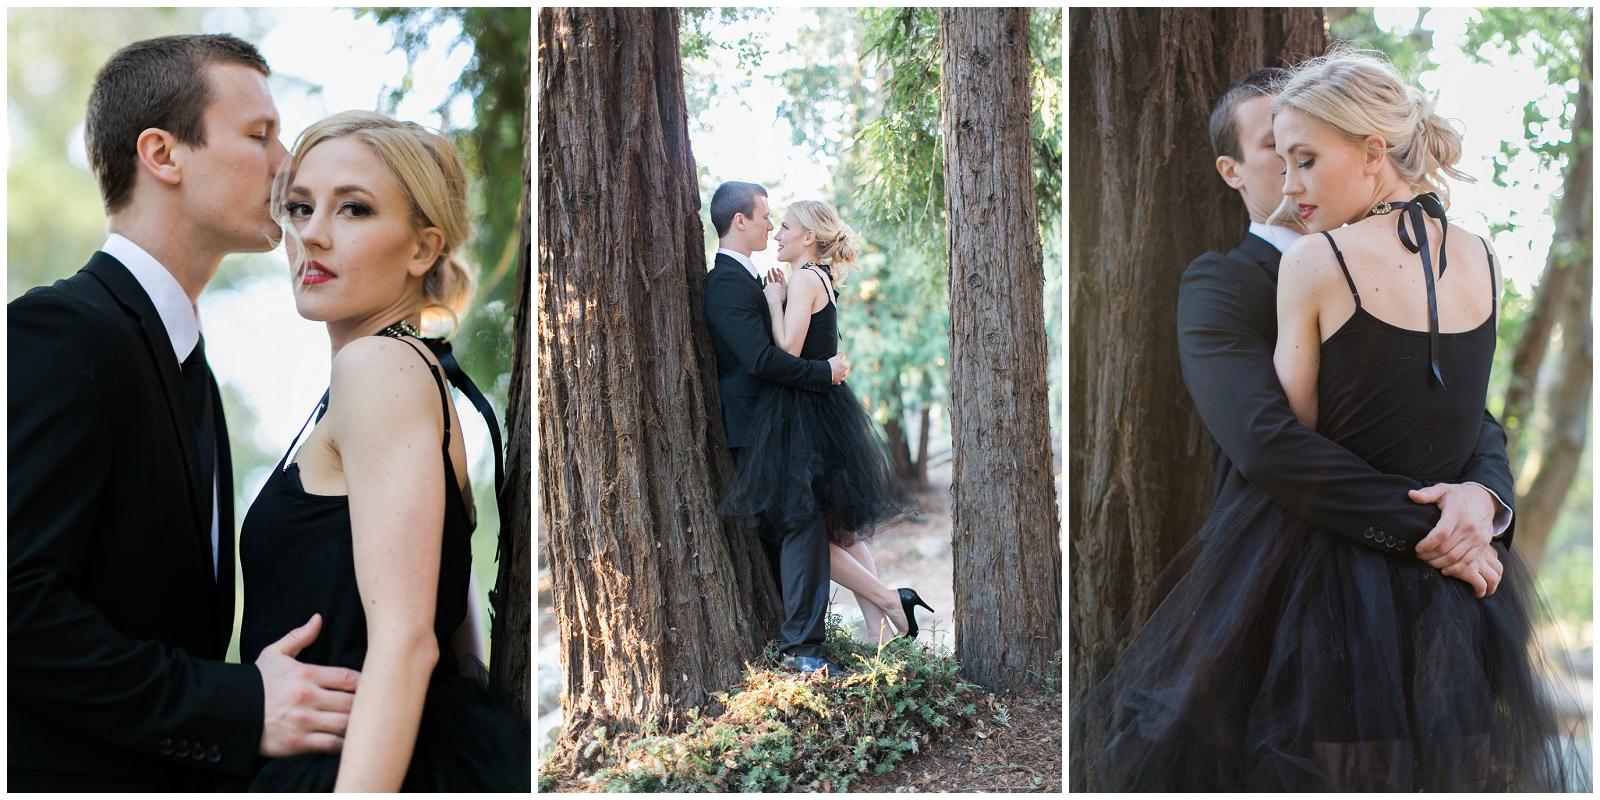 San-Francisco-Bay-Area-Wedding-Photography-Engagement-Redwoods-17.jpg